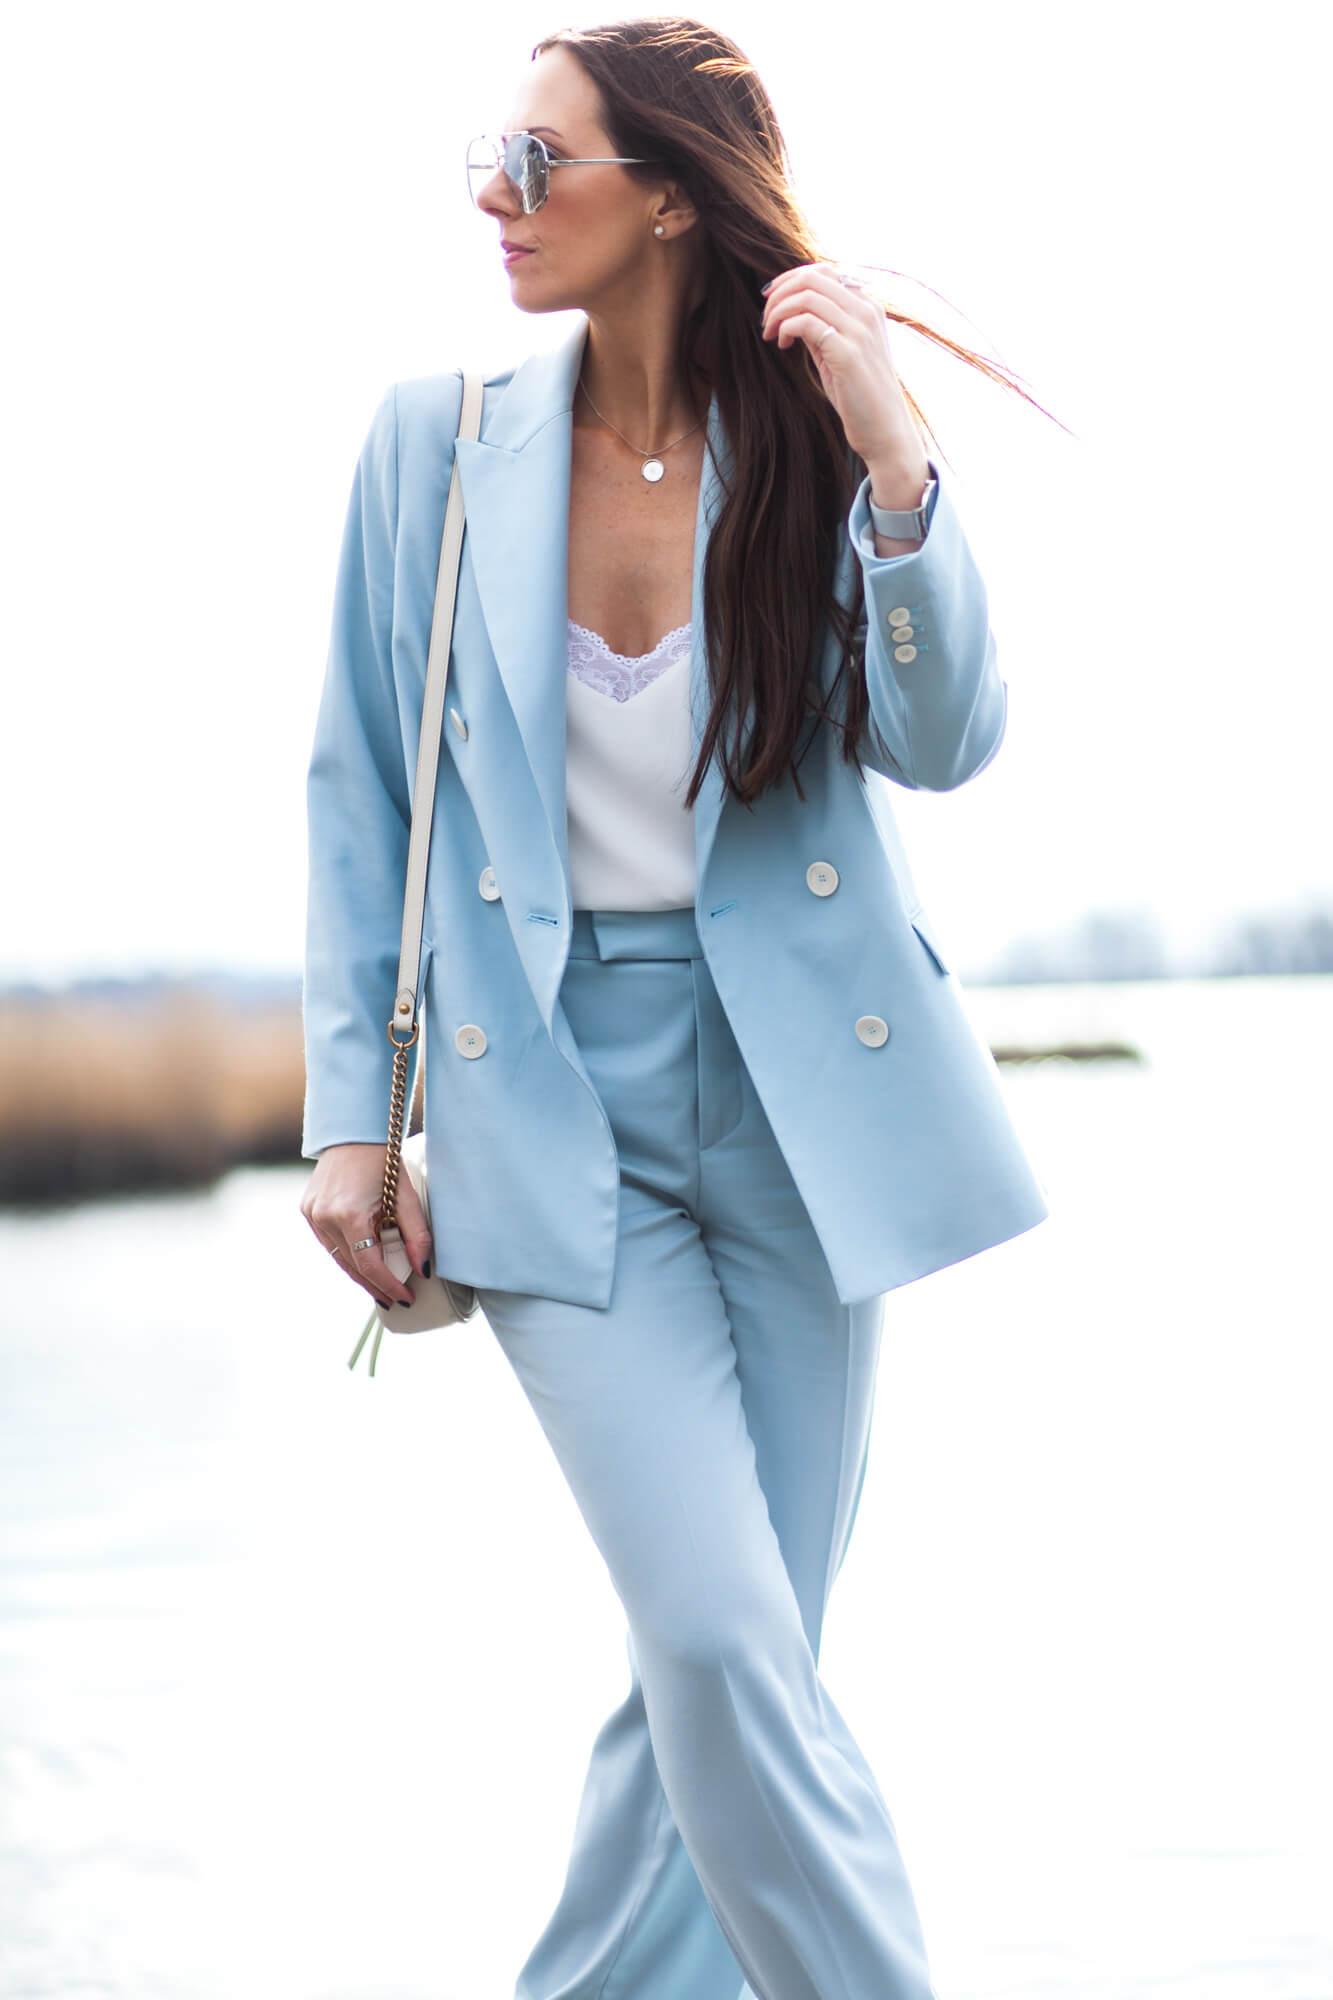 Female model, Dorset- fashion photographer